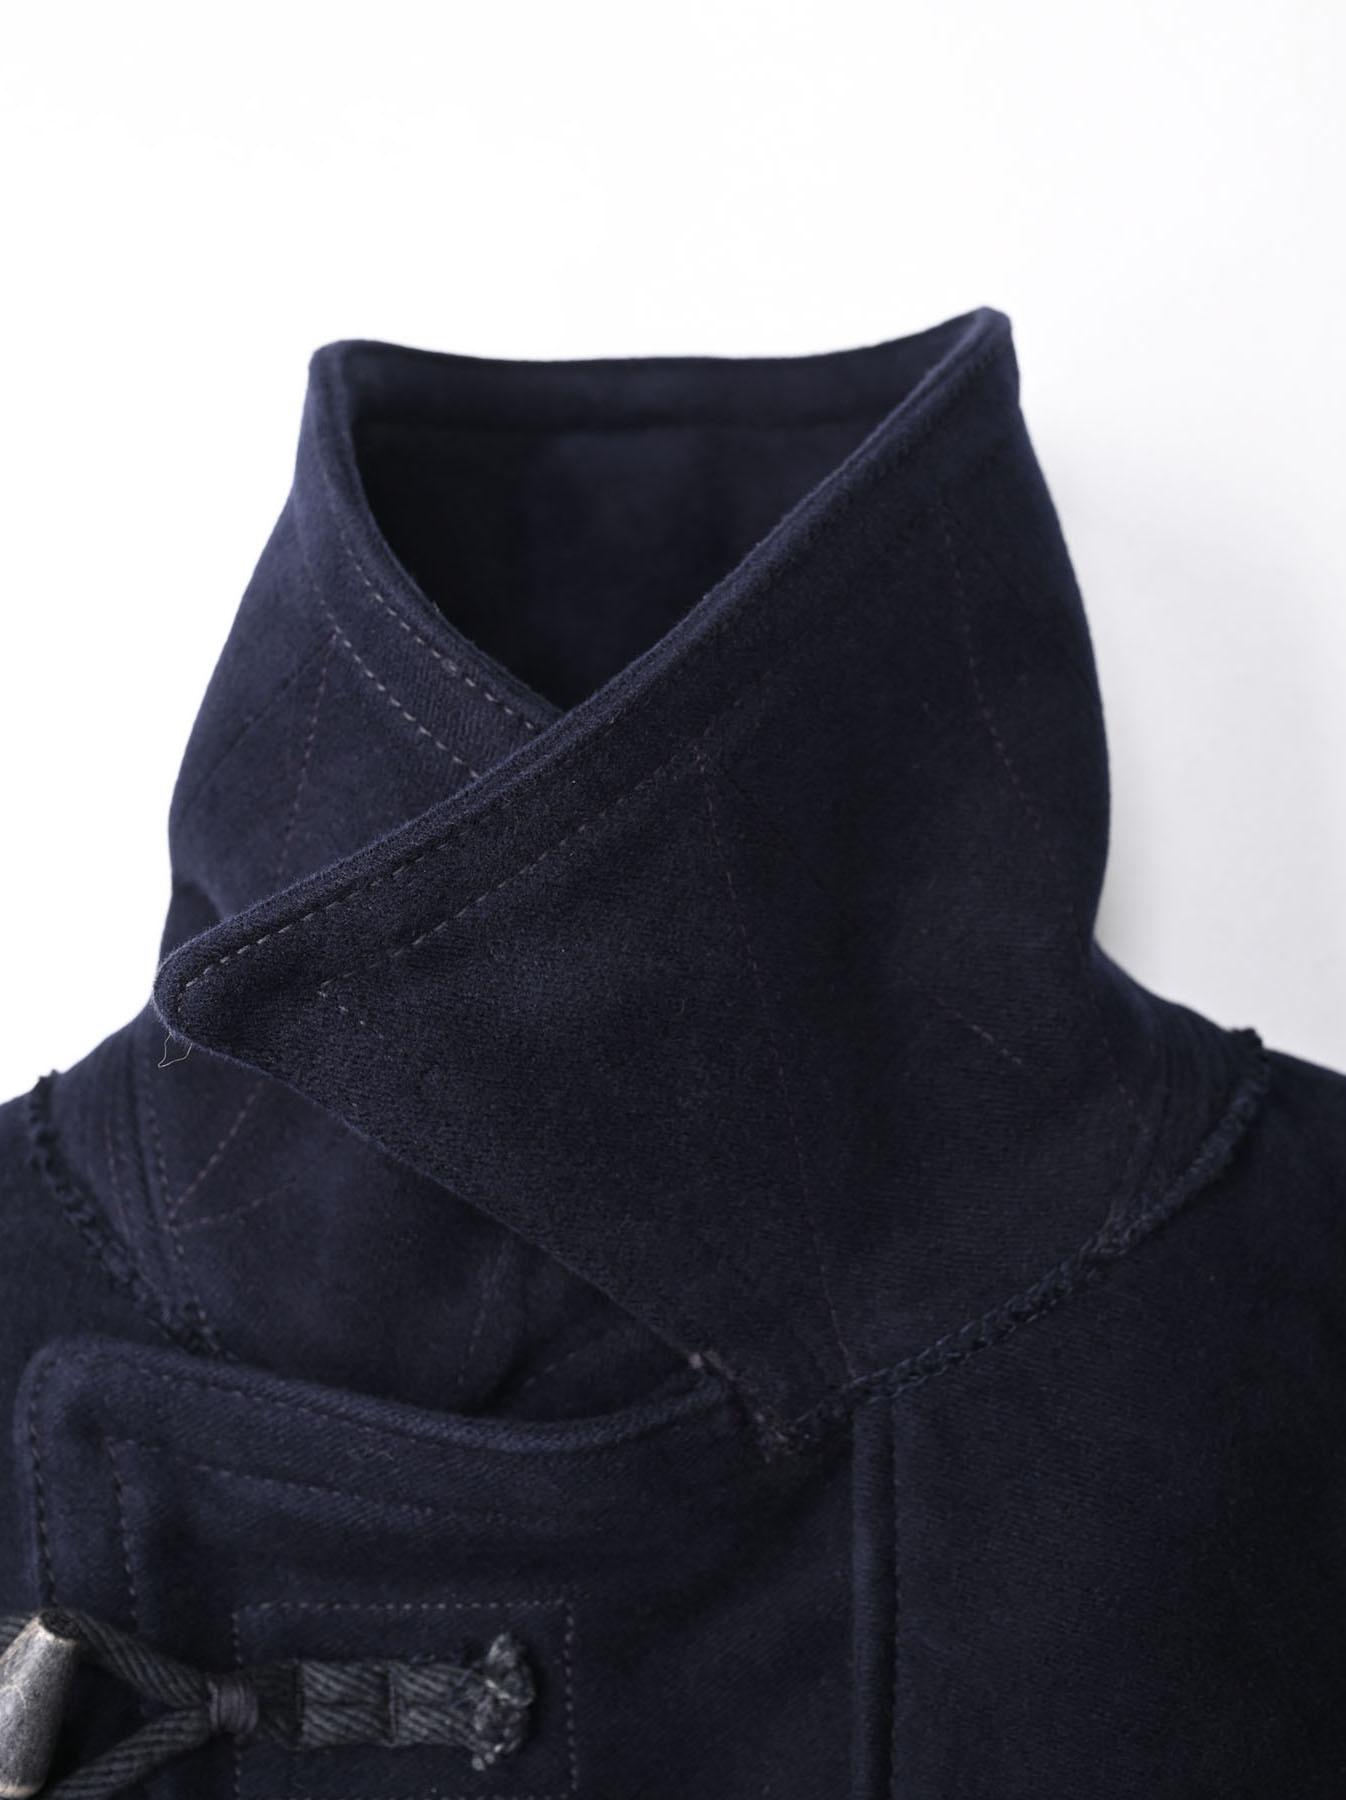 Thick Cotton Flannel Akiya Jacket-5